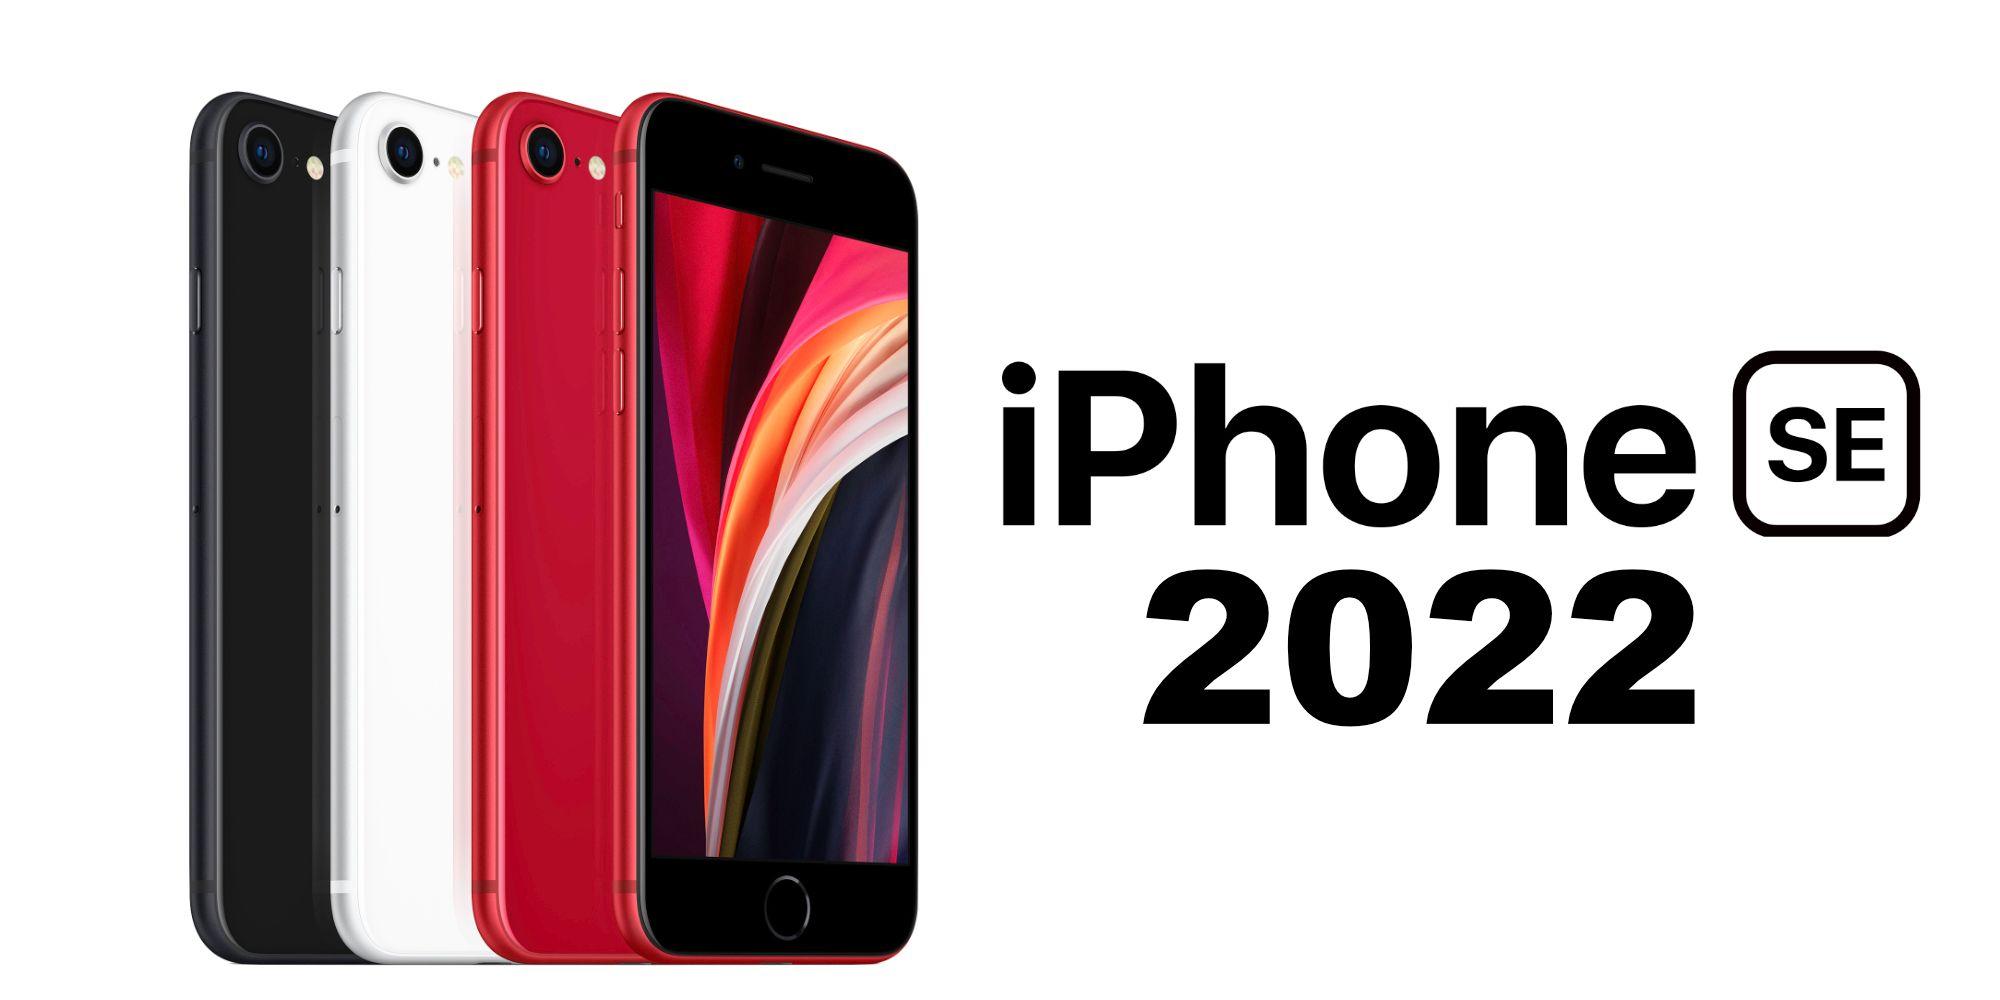 apple-iphone-se-2022-rumors